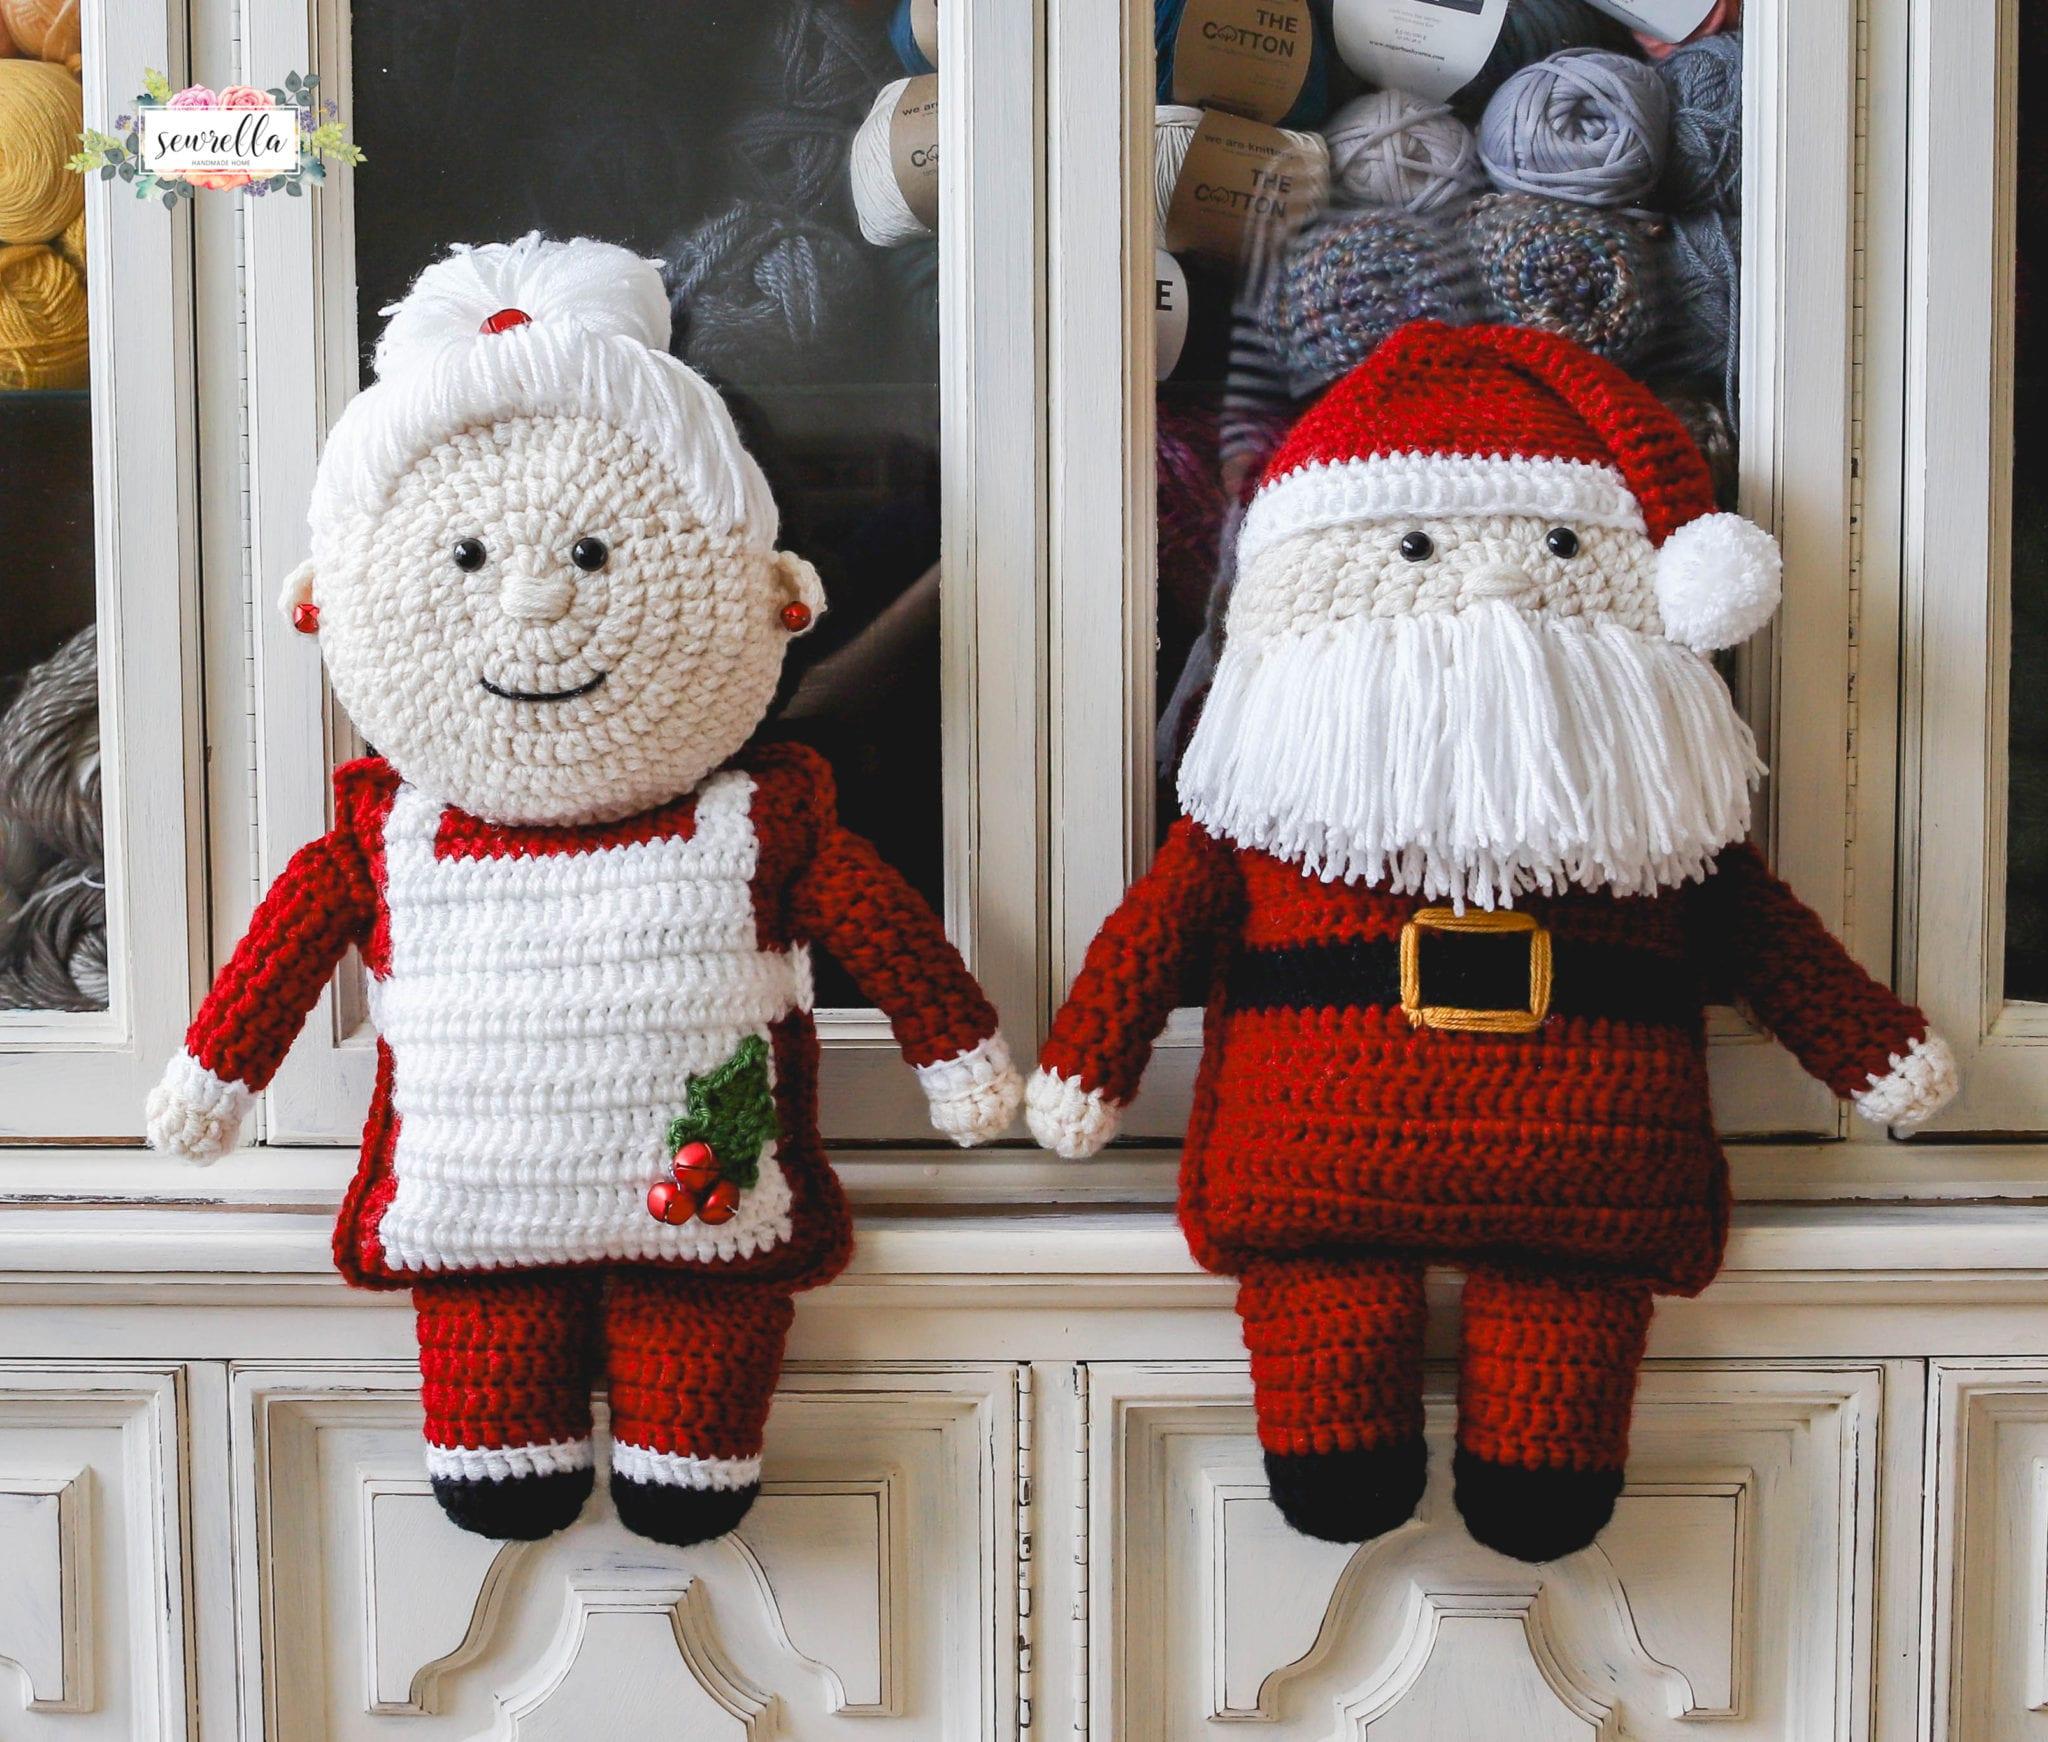 Crochet Mrs. Claus - Sewrella